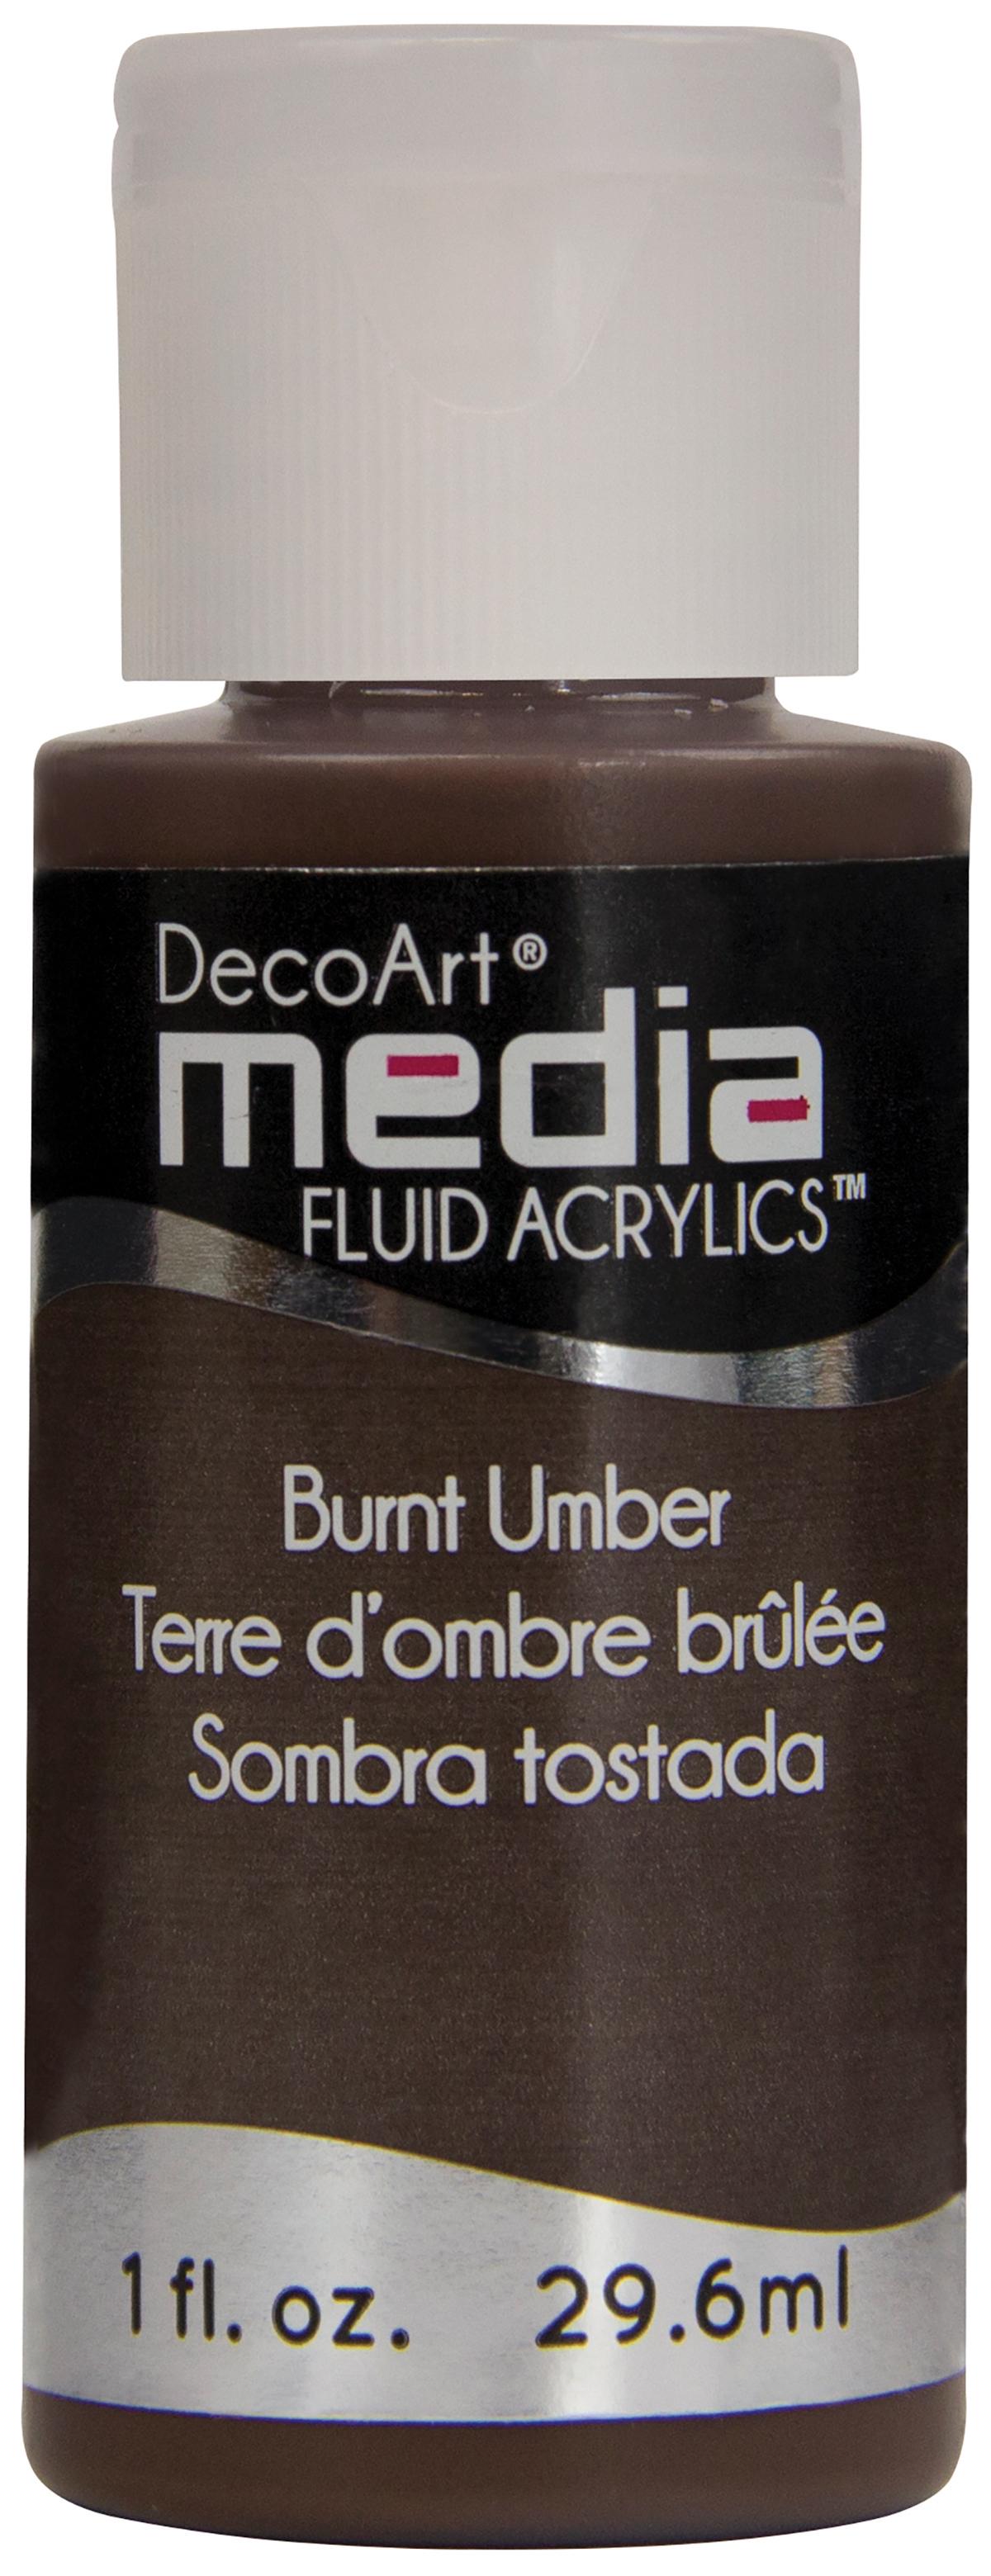 DecoArt Media Fluid Acrylics Paint 1oz-Burnt Umber (Series 1)